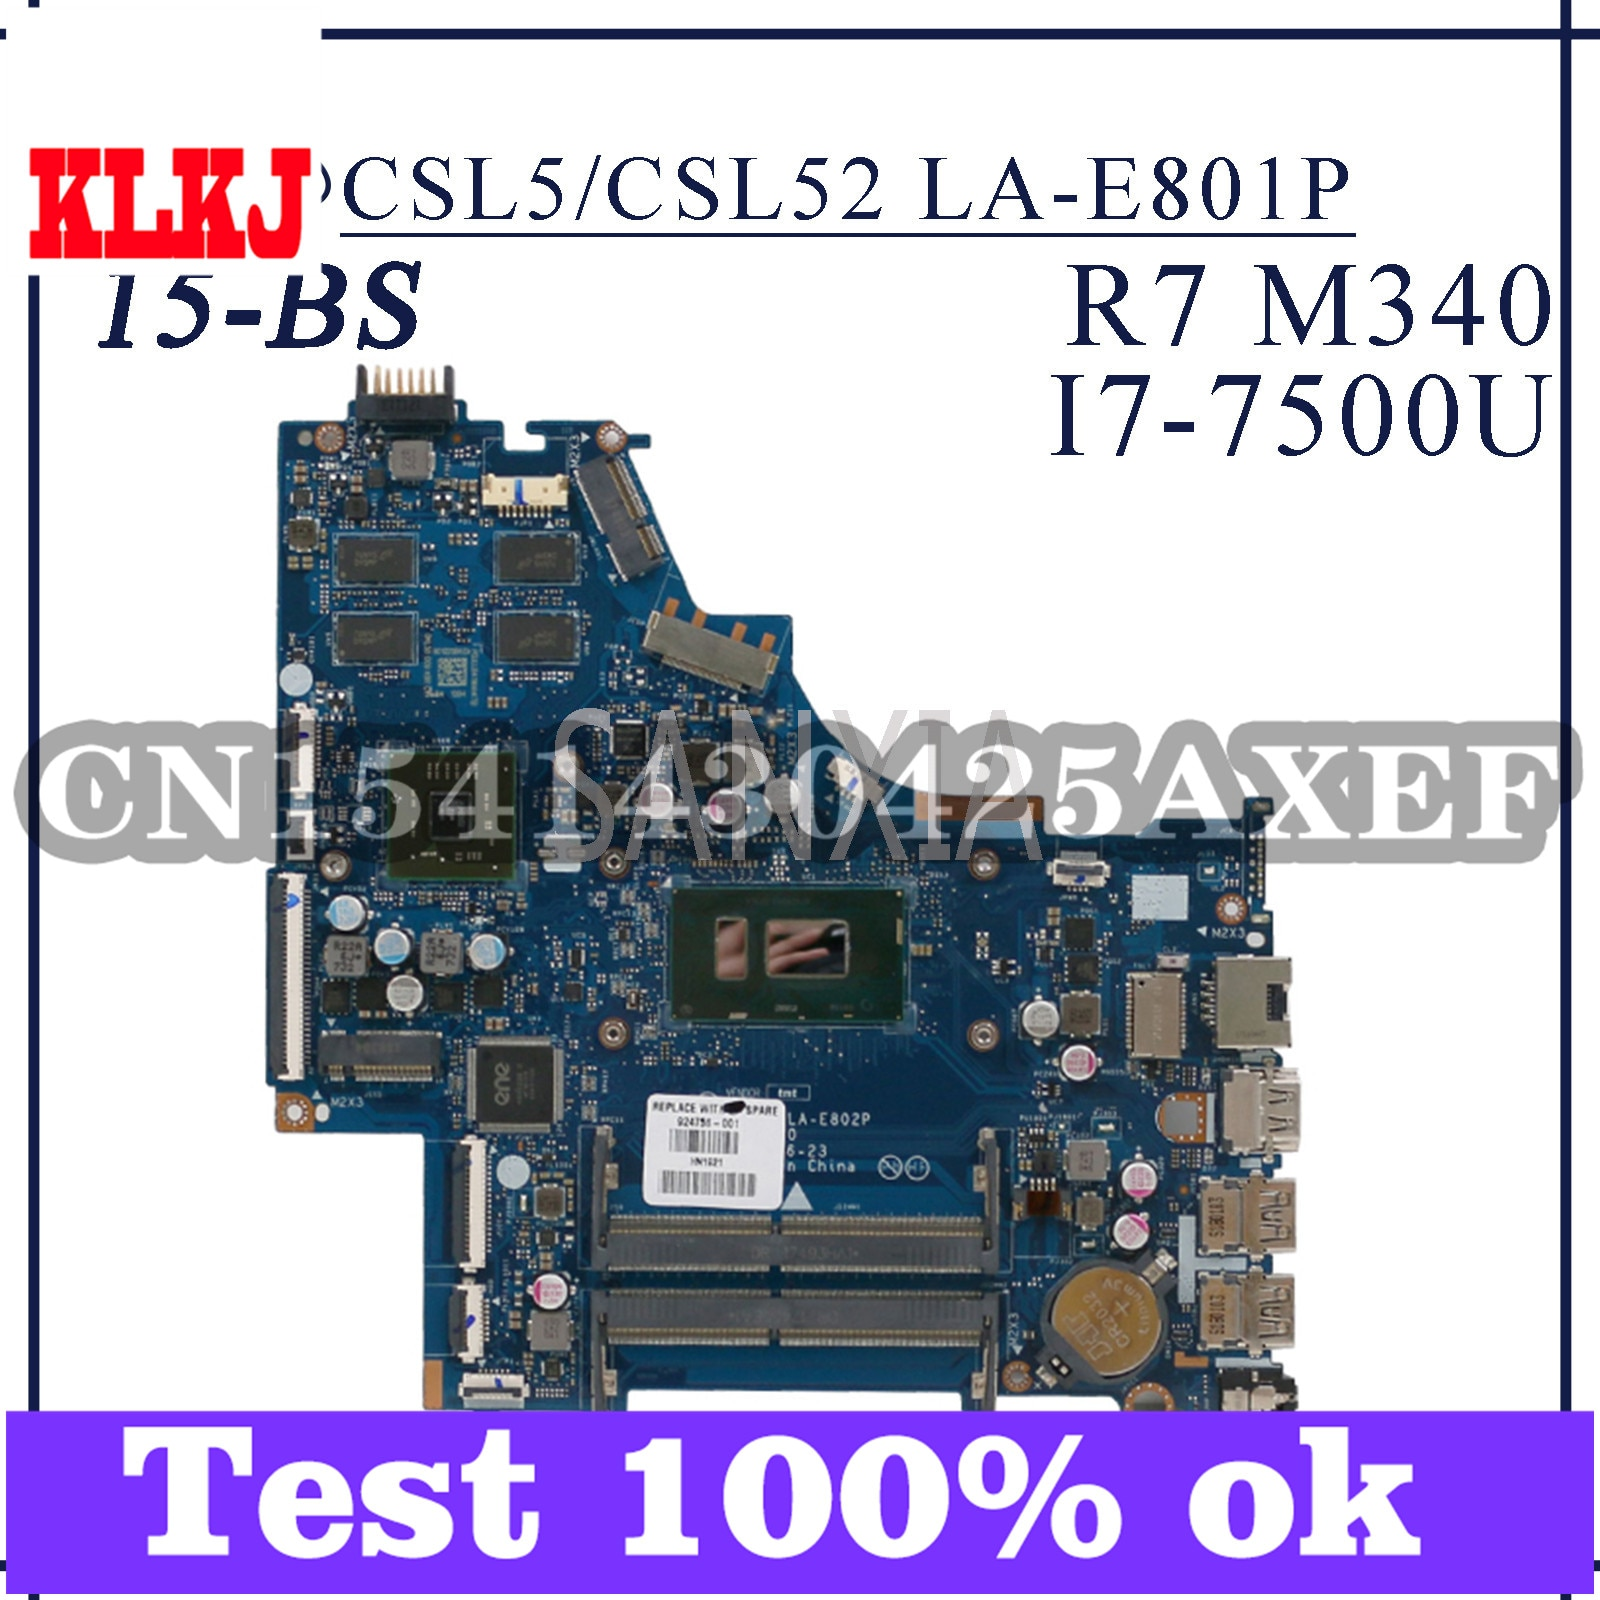 KLKJ CSL5/CSL52 LA-E801P محمول لوحة رئيسية لأجهزة HP 15-BS اللوحة الأصلية I7-7500U PM 924756-001 924756-501 924756-601